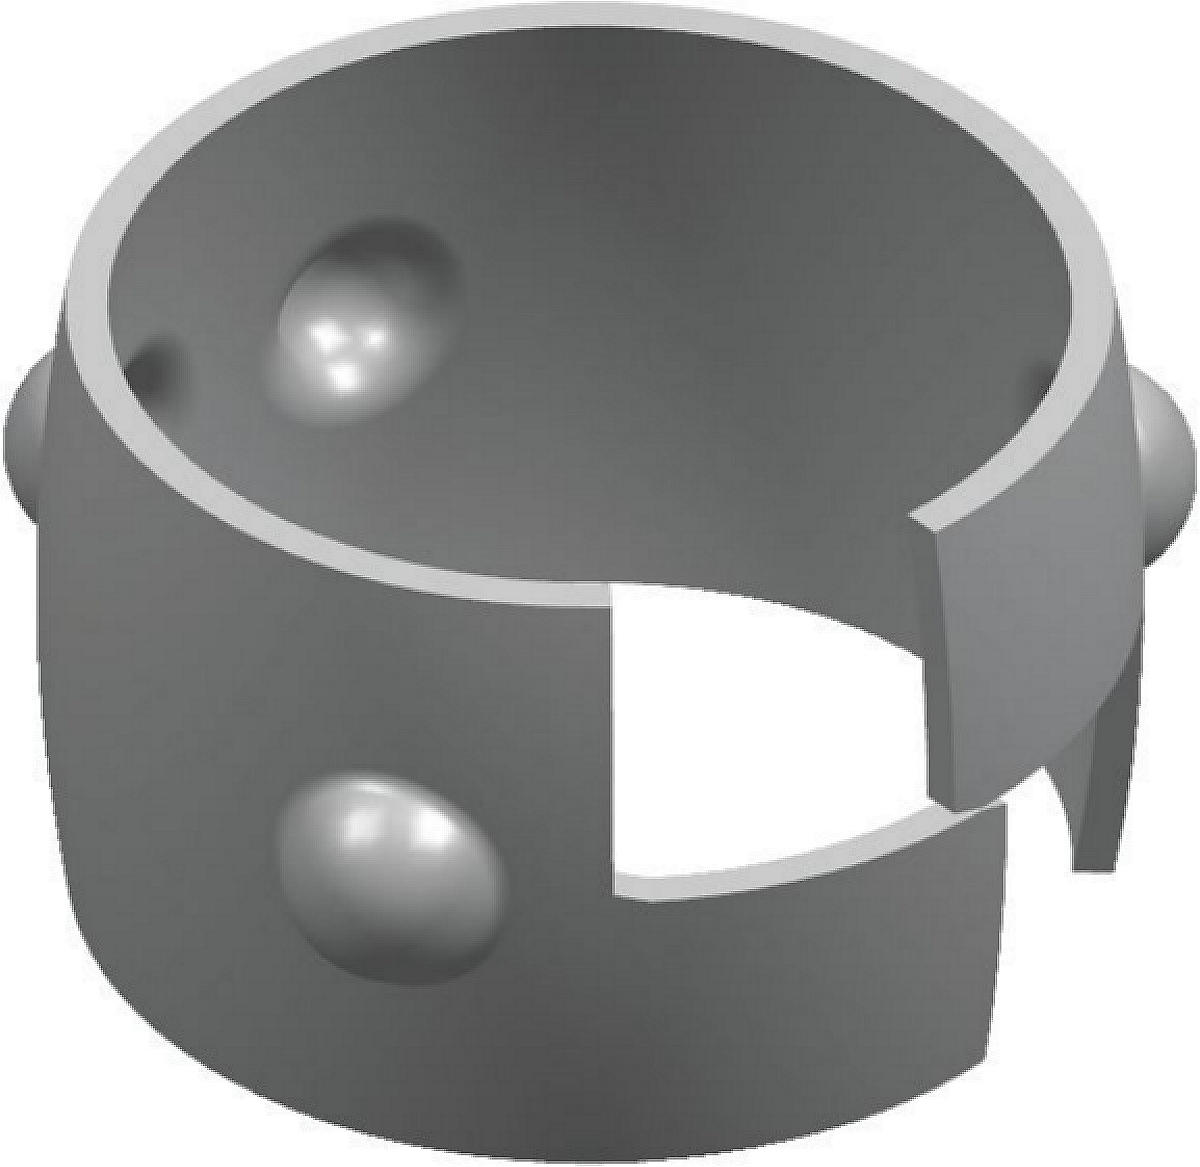 25mm Shank Accessories